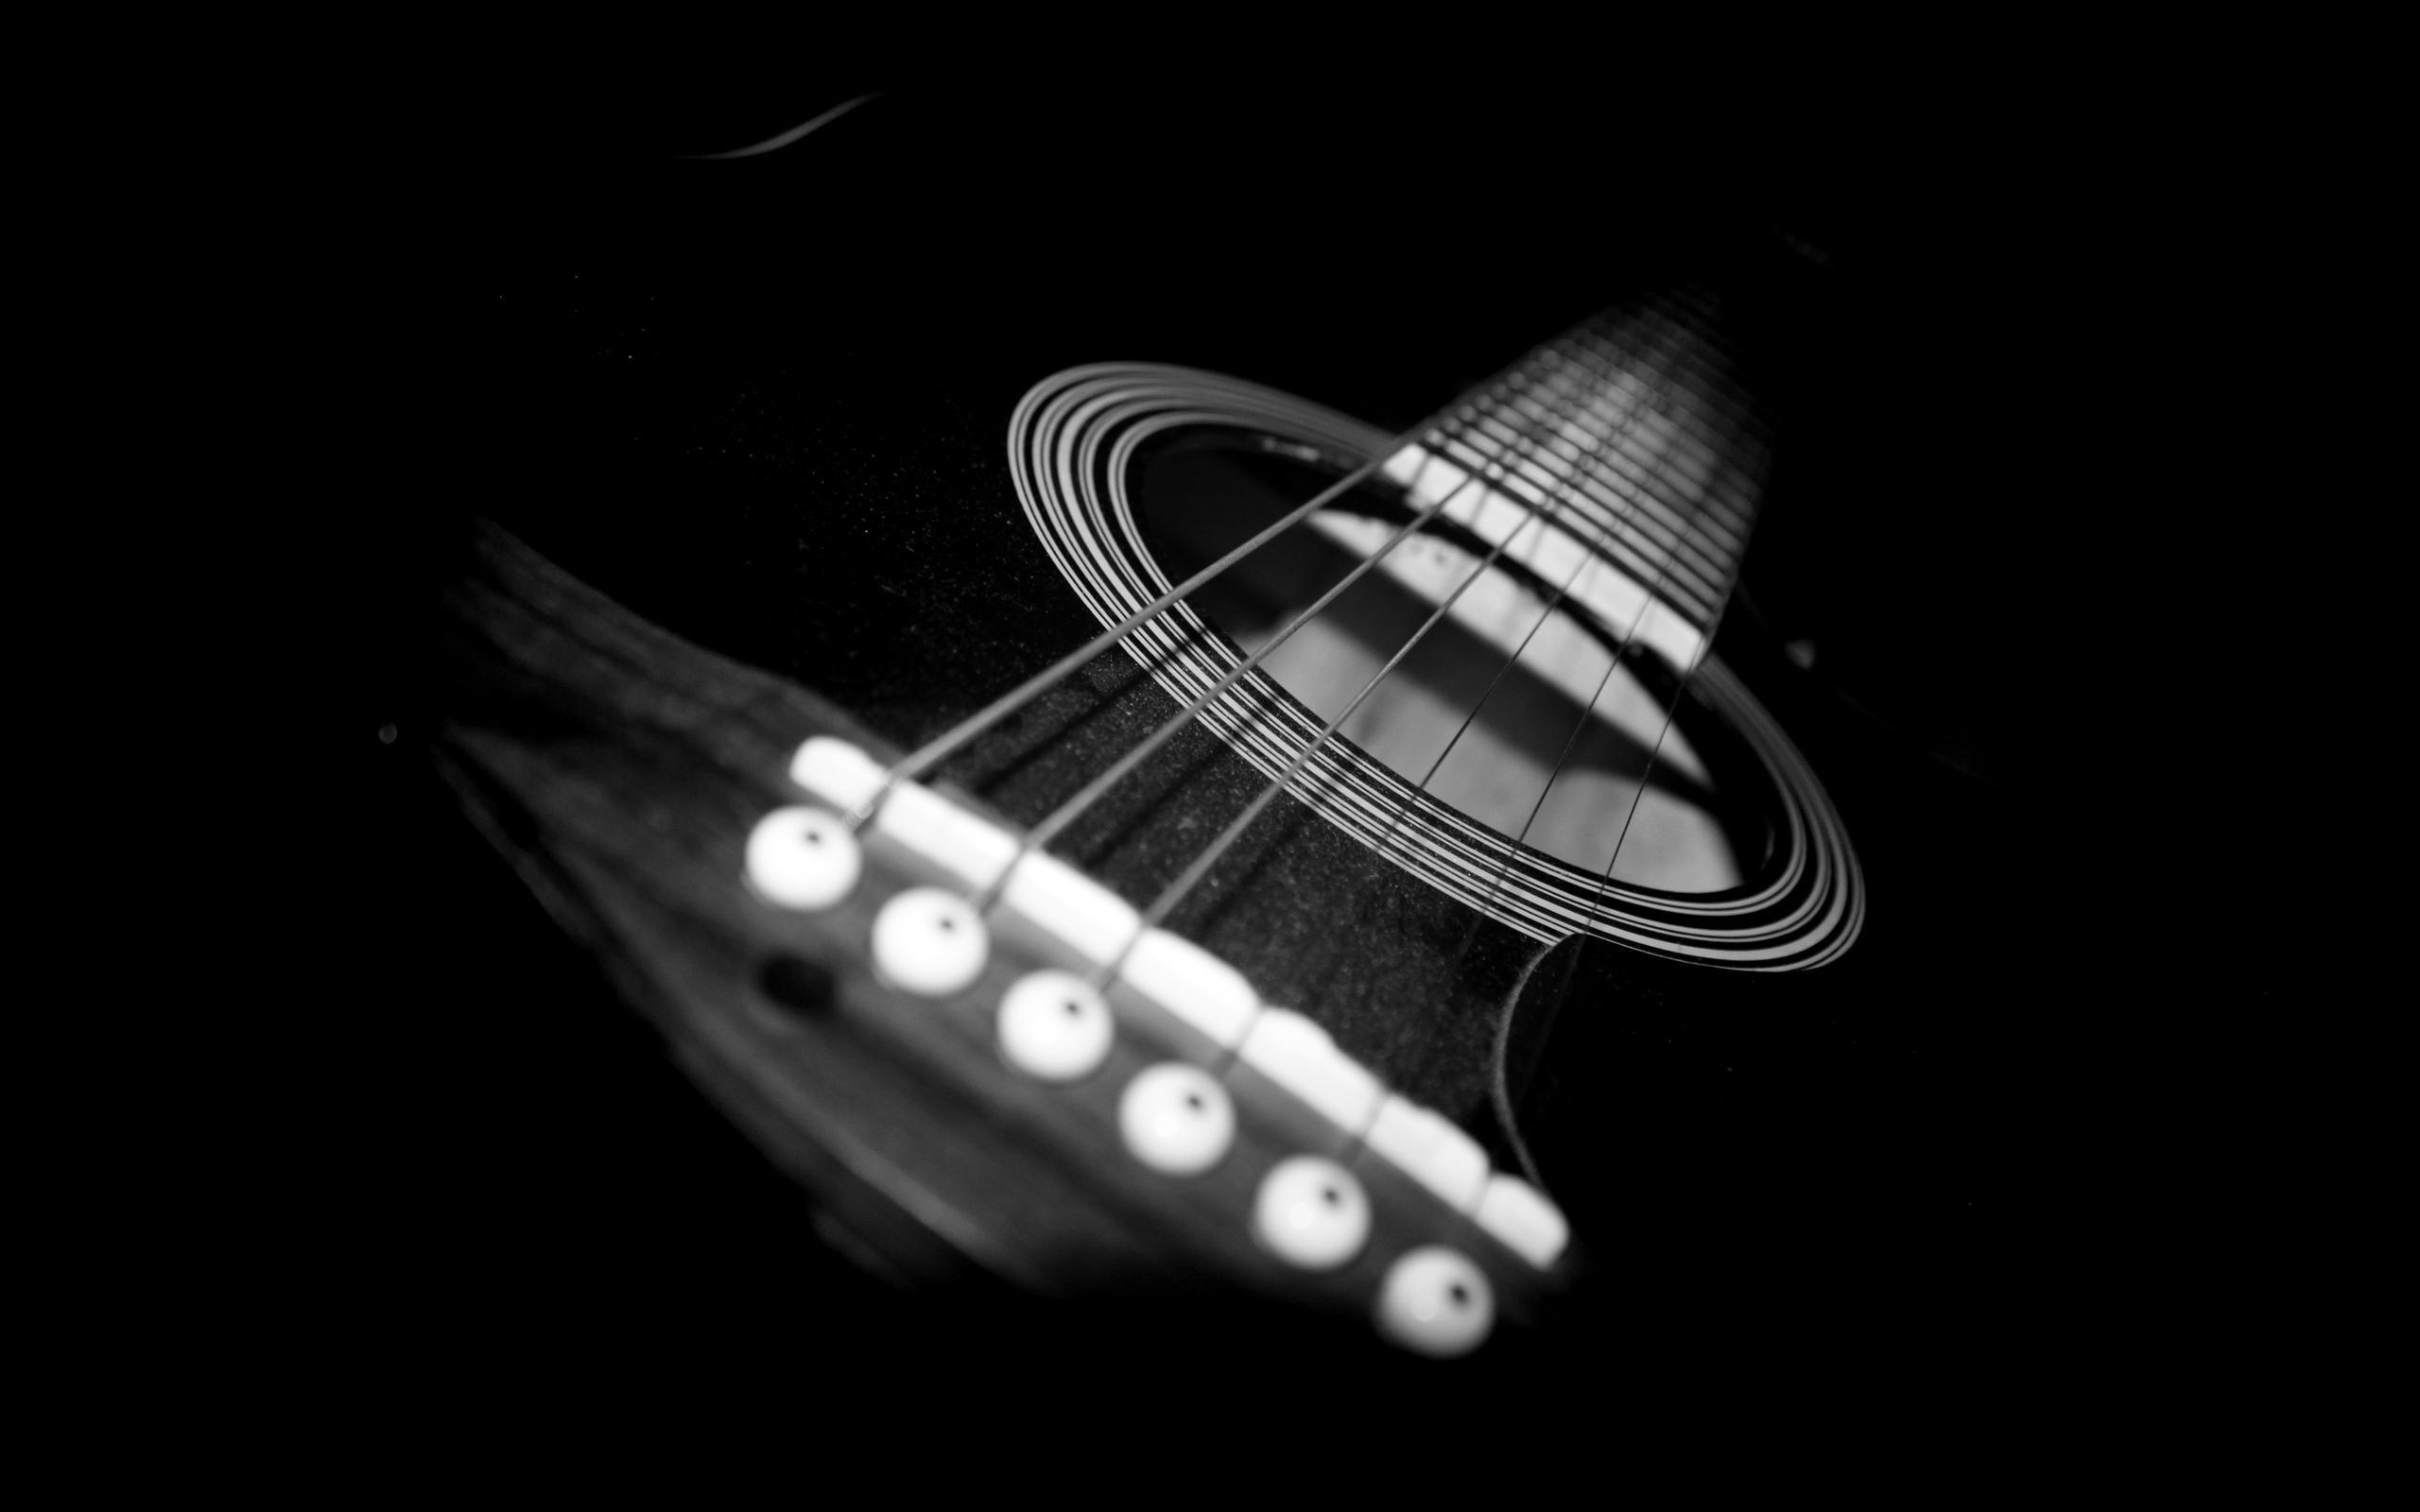 Hd Guitar Wallpaper, Amazing Photos of Guitar 4K Ultra HD | NMgnCP com